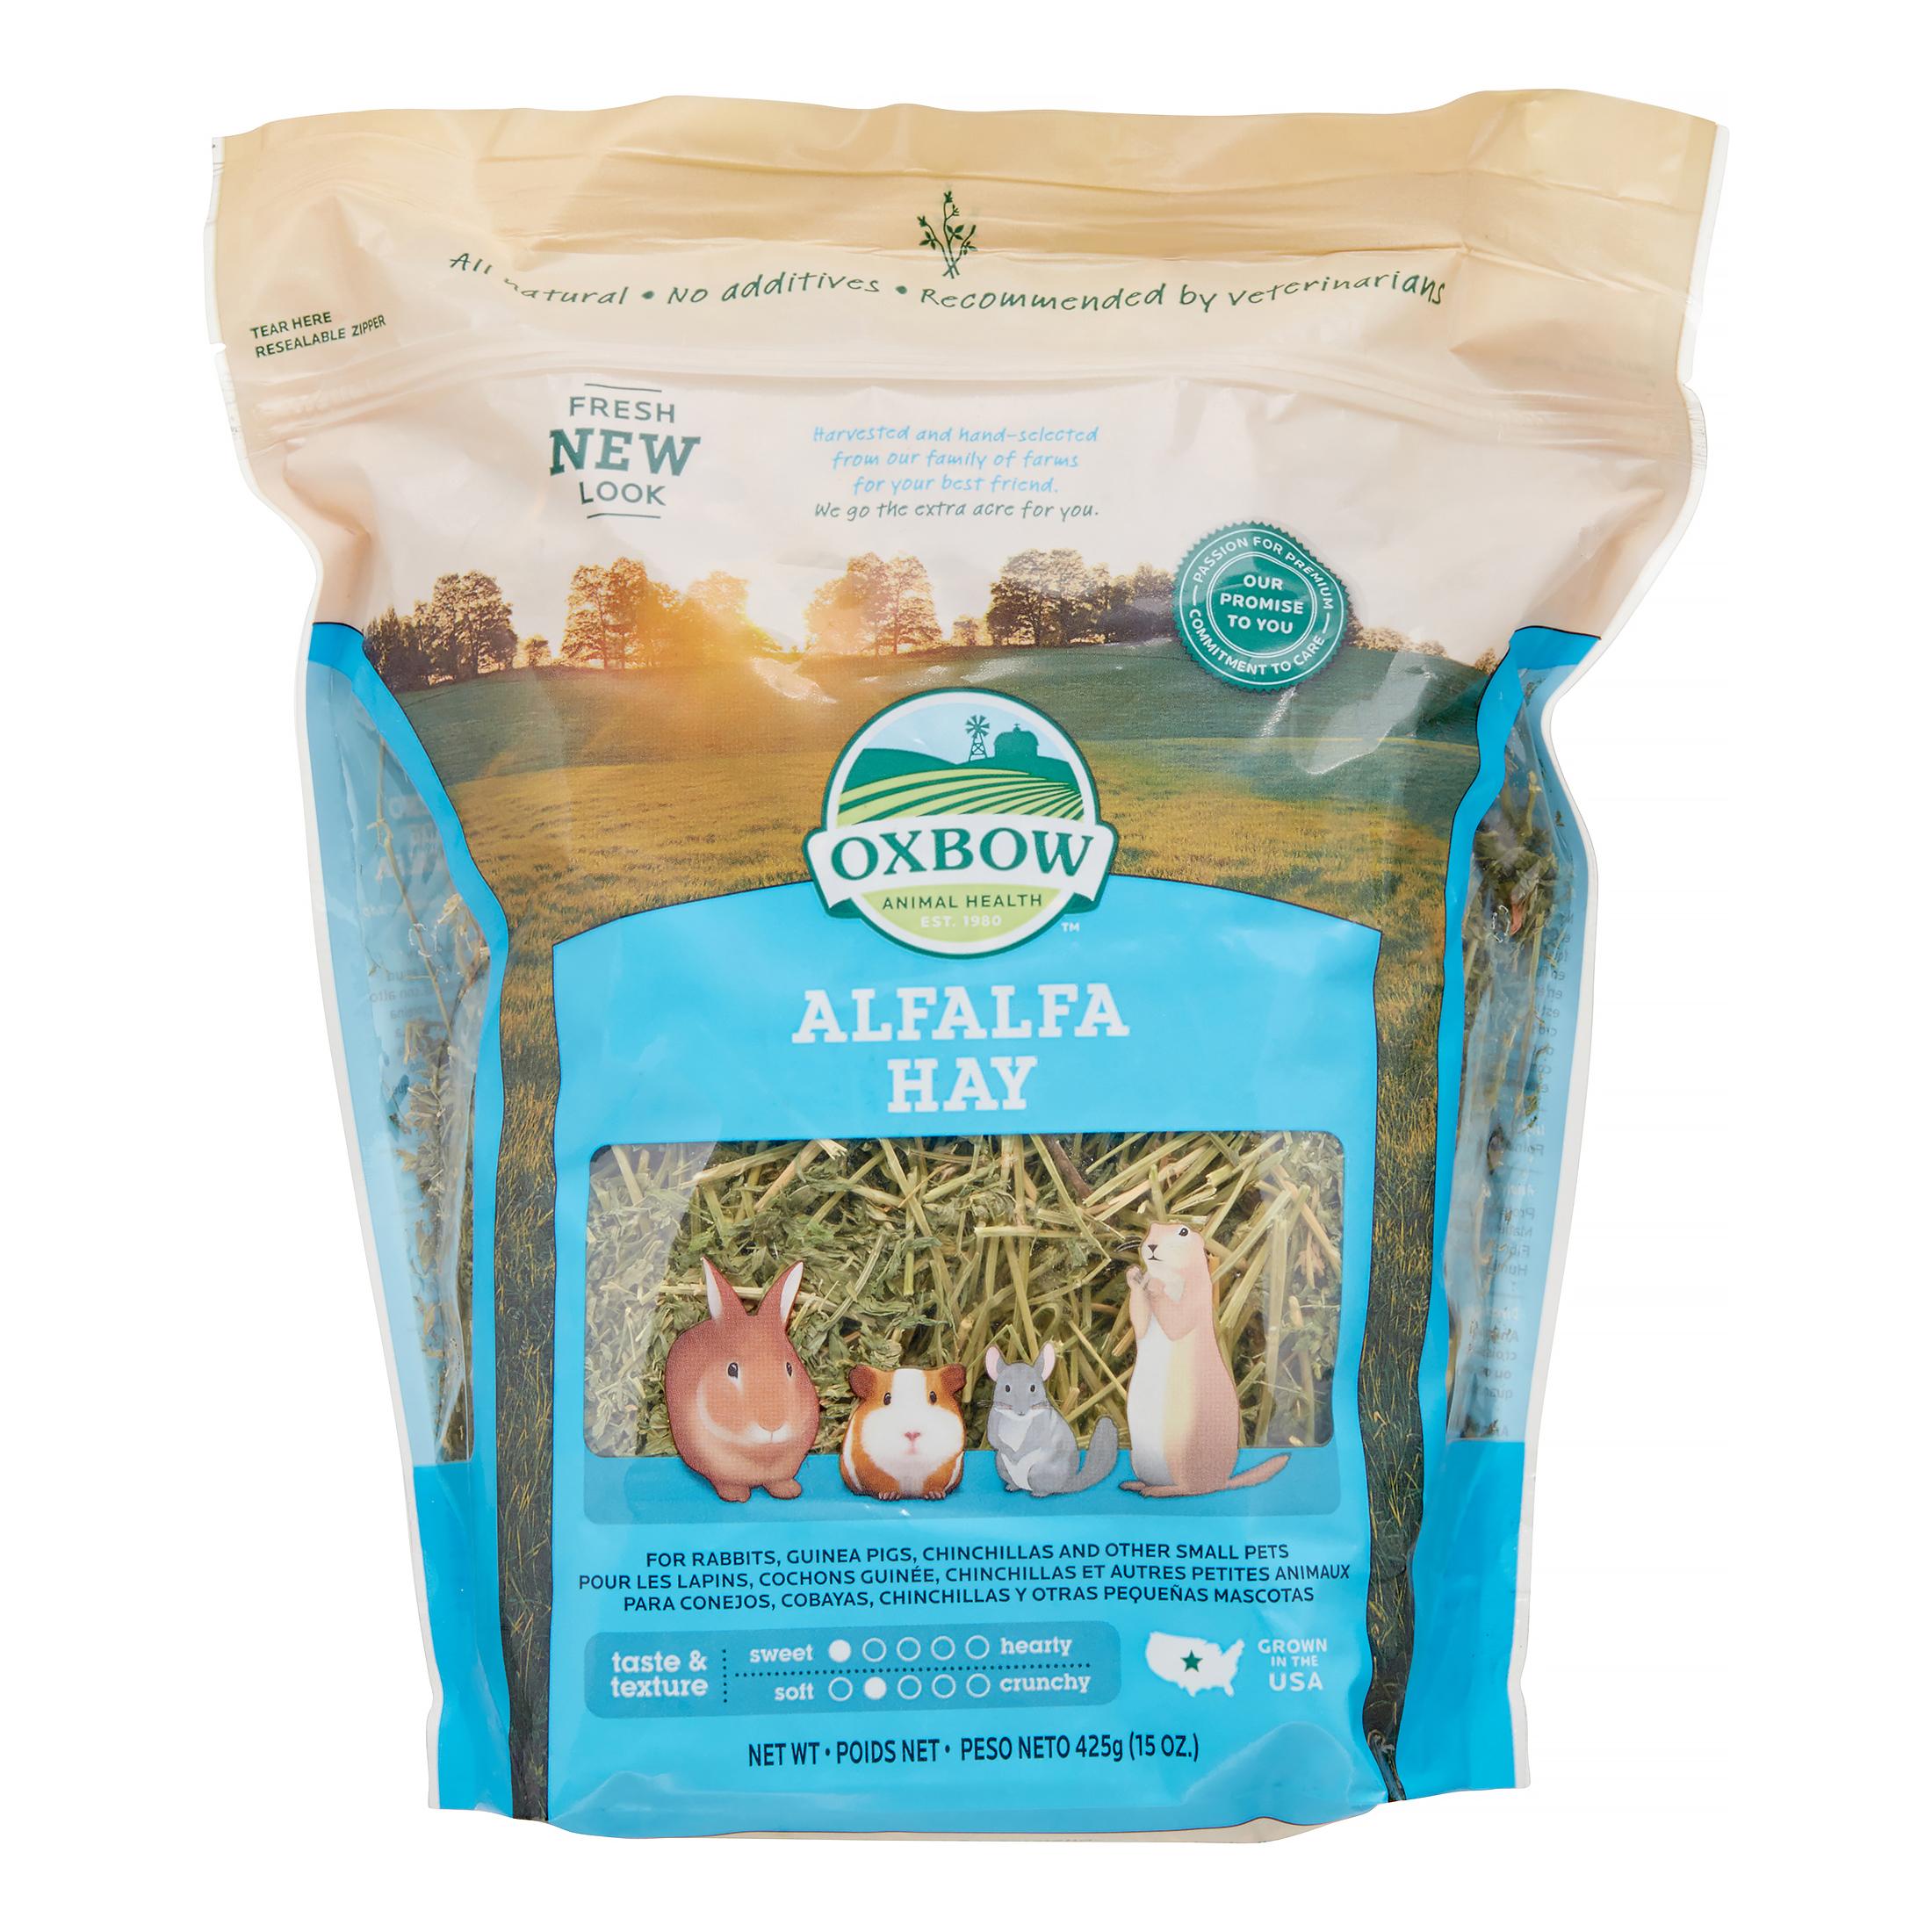 Oxbow Alfalfa Hay Dry Small Animal Food, 15 oz.